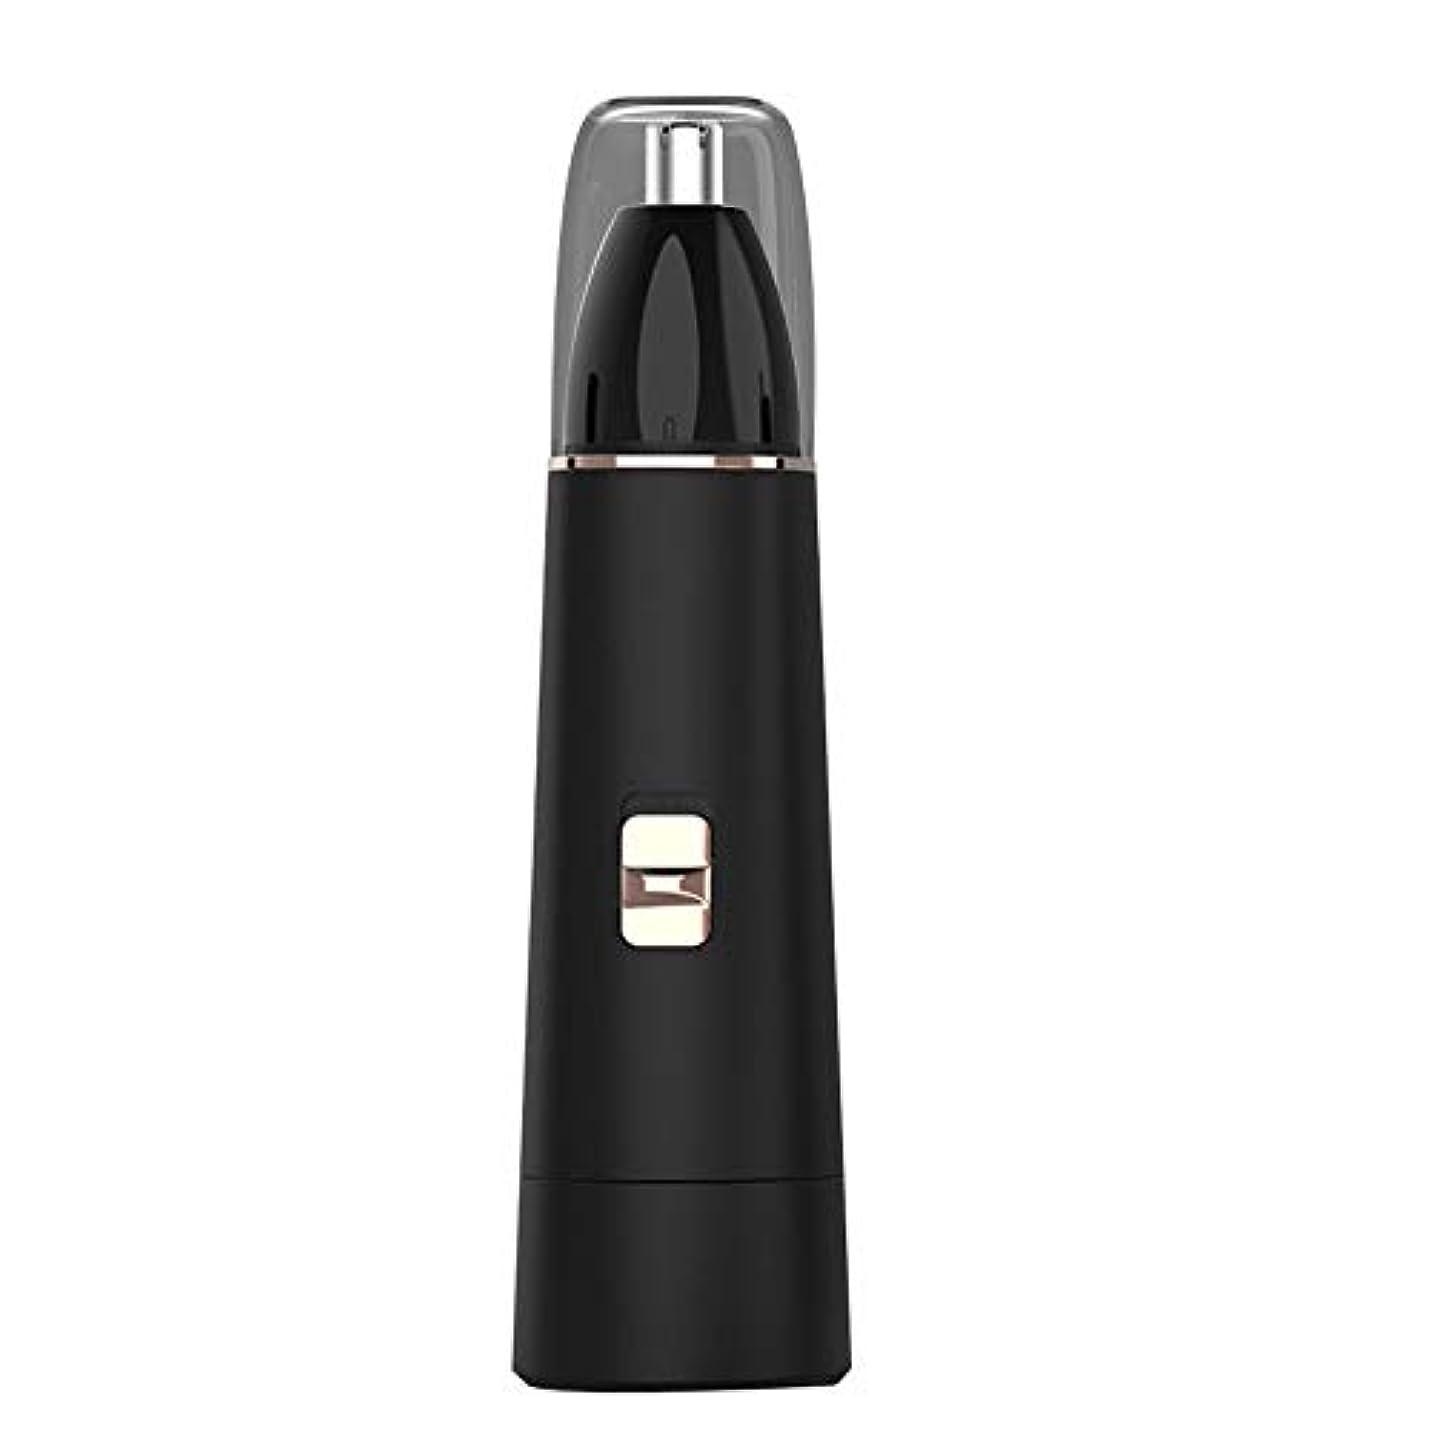 単語自動化著作権鼻毛トリマー-USB充電式電動鼻毛トリマー/ABS素材/多機能 操作が簡単